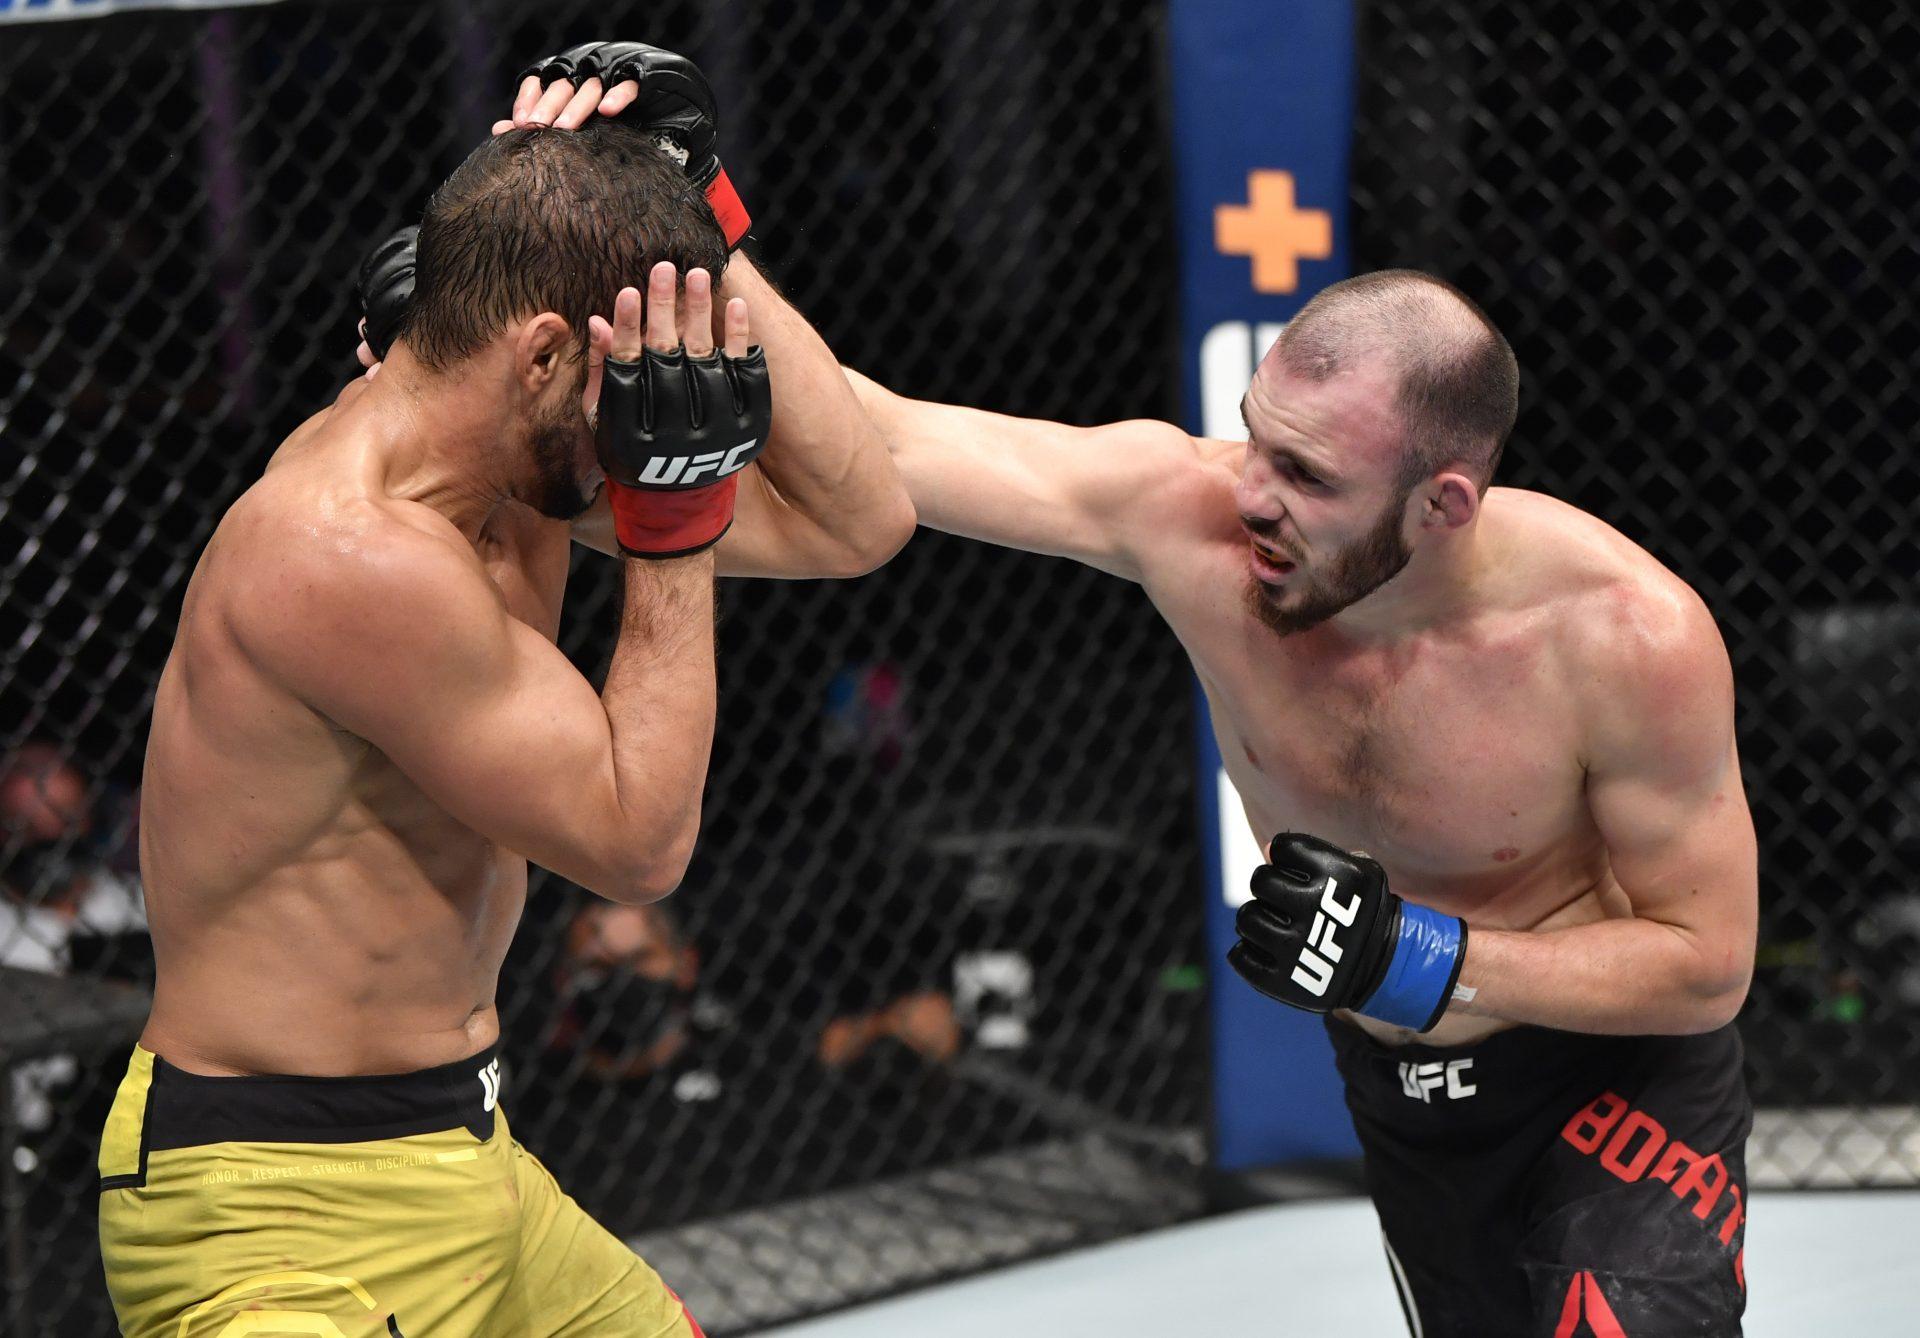 Lightweight fighter Roman Bogatov cut by the UFC - Roman Bogatov